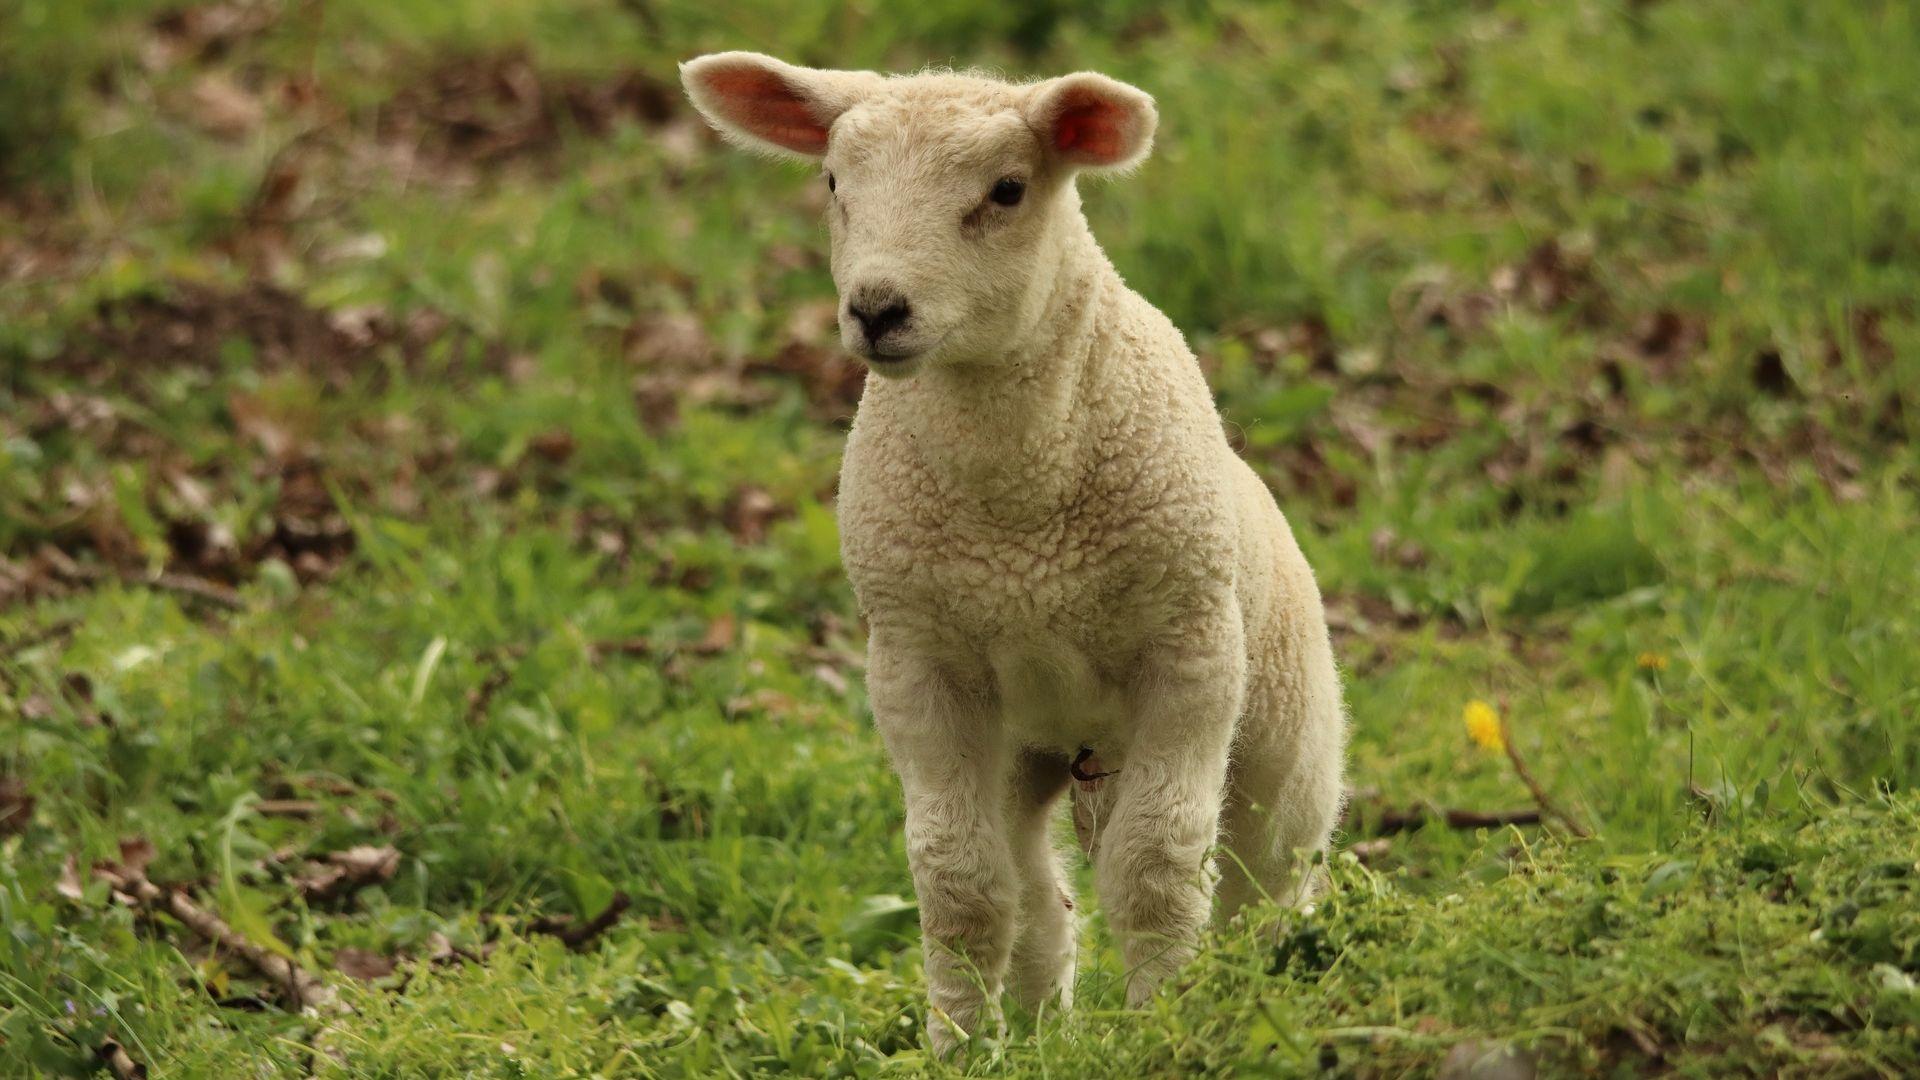 Lamb Baby Sheep Animal Cute Wallpaper